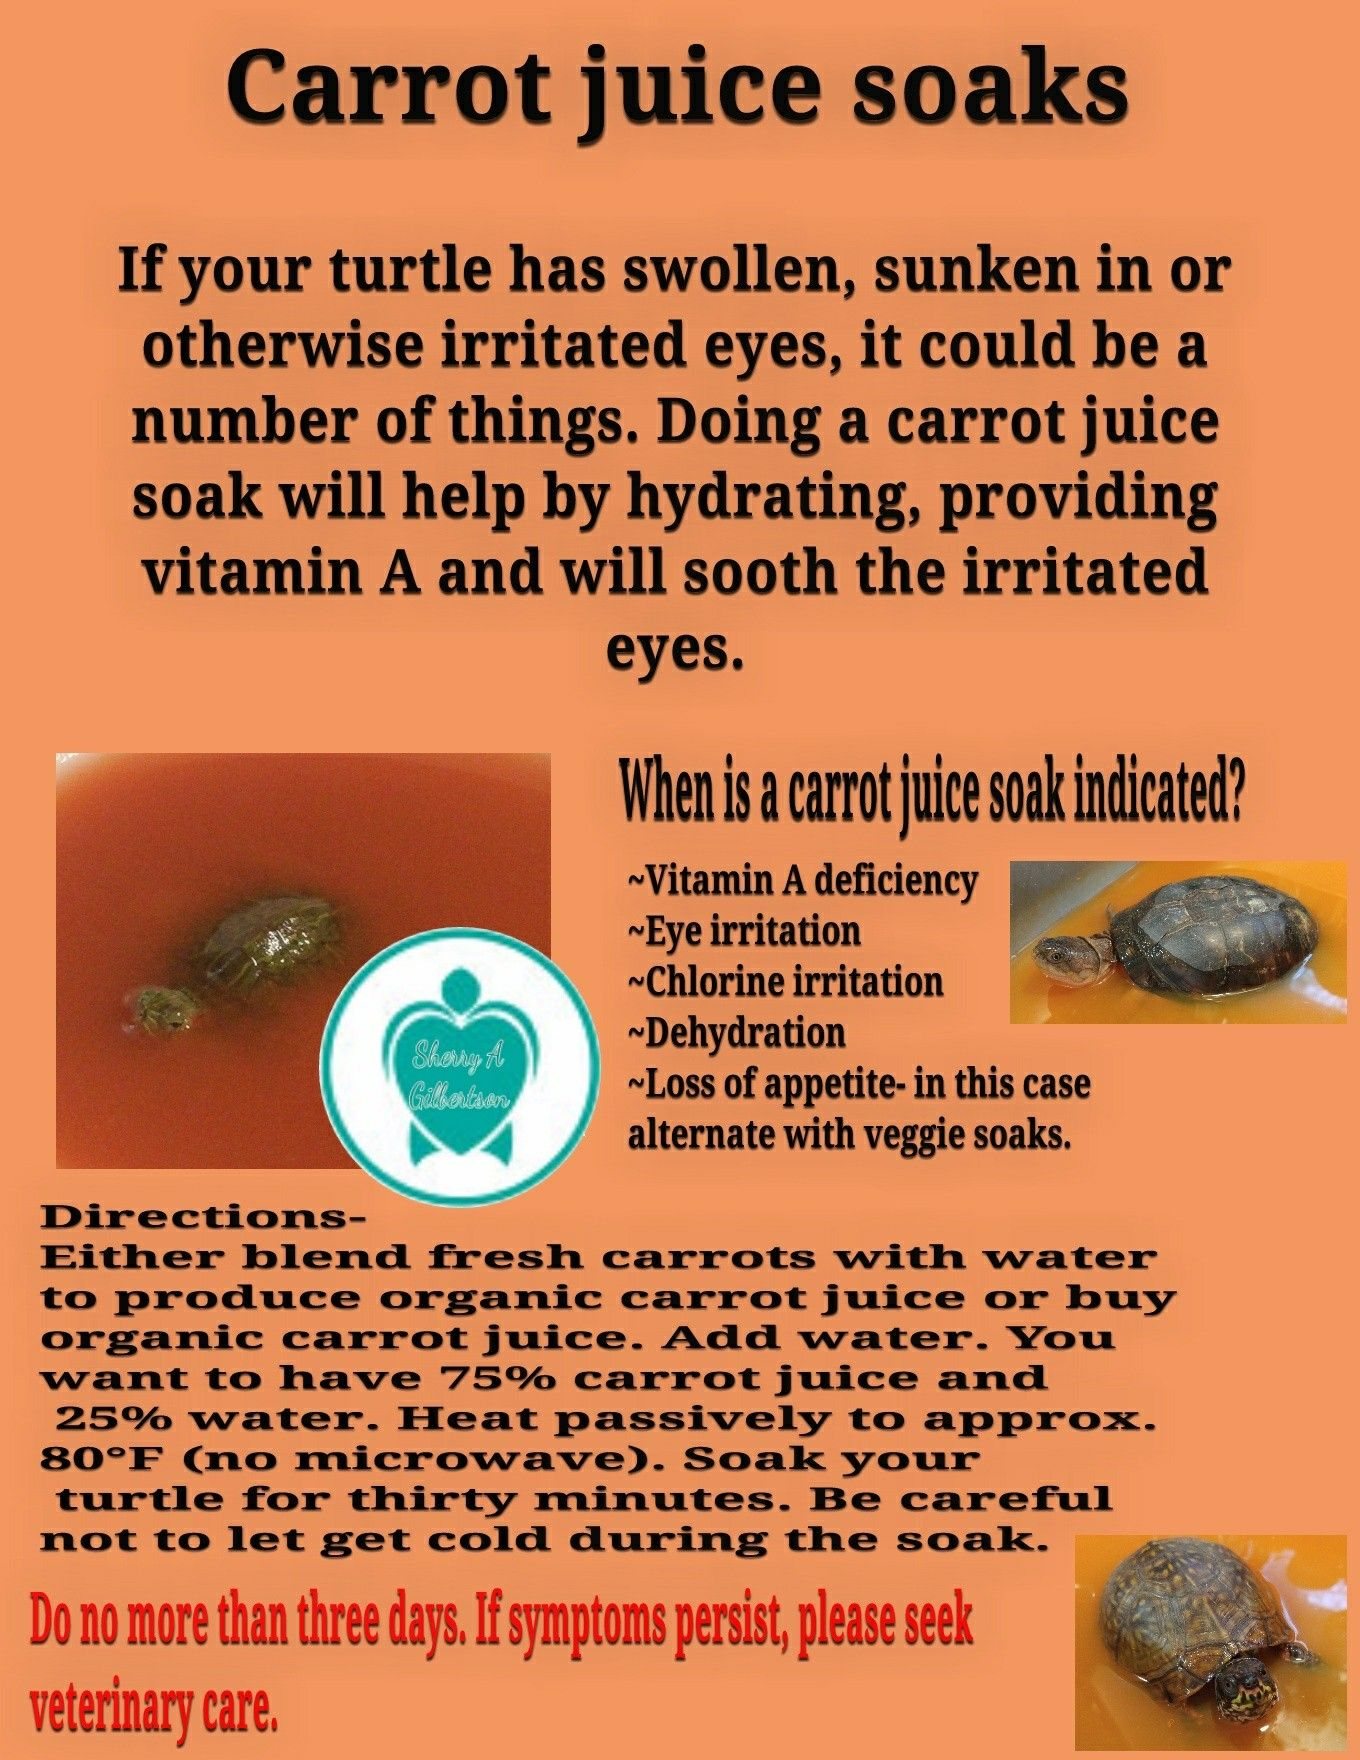 Carrot Juice Soak For Turtle Tortoise Turtle Care Pet Turtle Yellow Bellied Slider